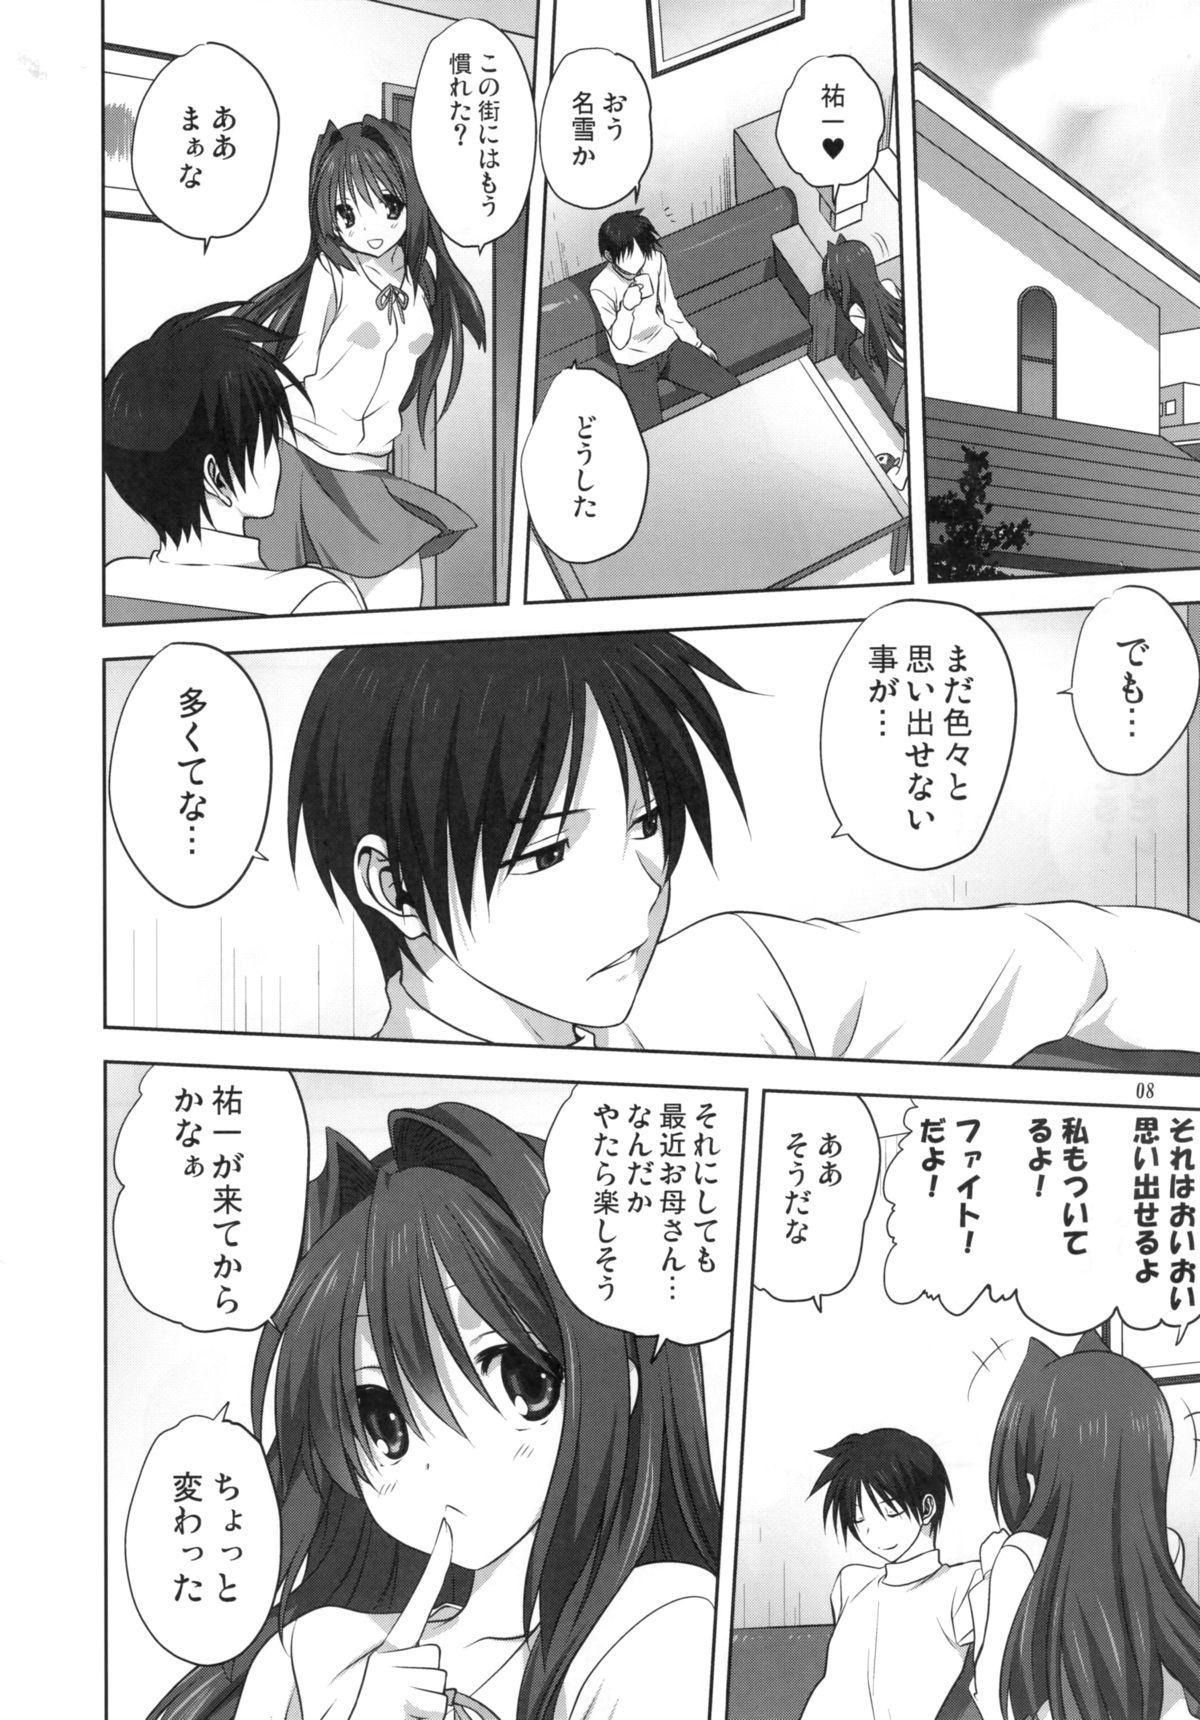 Akiko-san to Issho 16 6